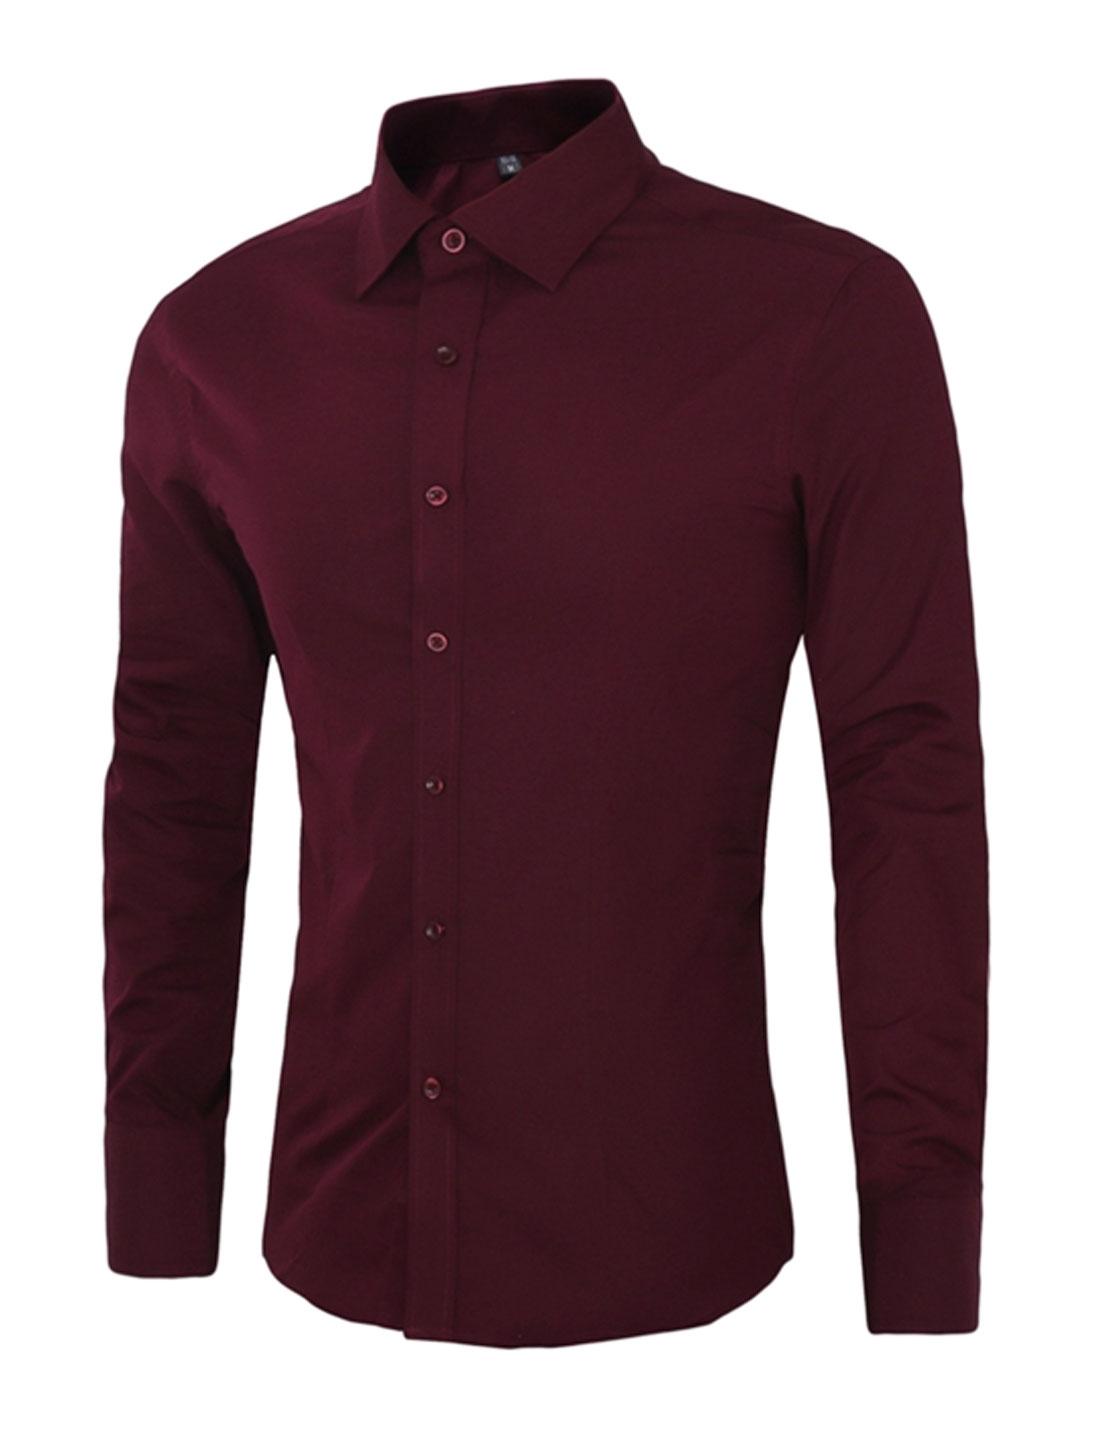 Men Button Closure Long Sleeve Slim Fit Dress Shirt Red M